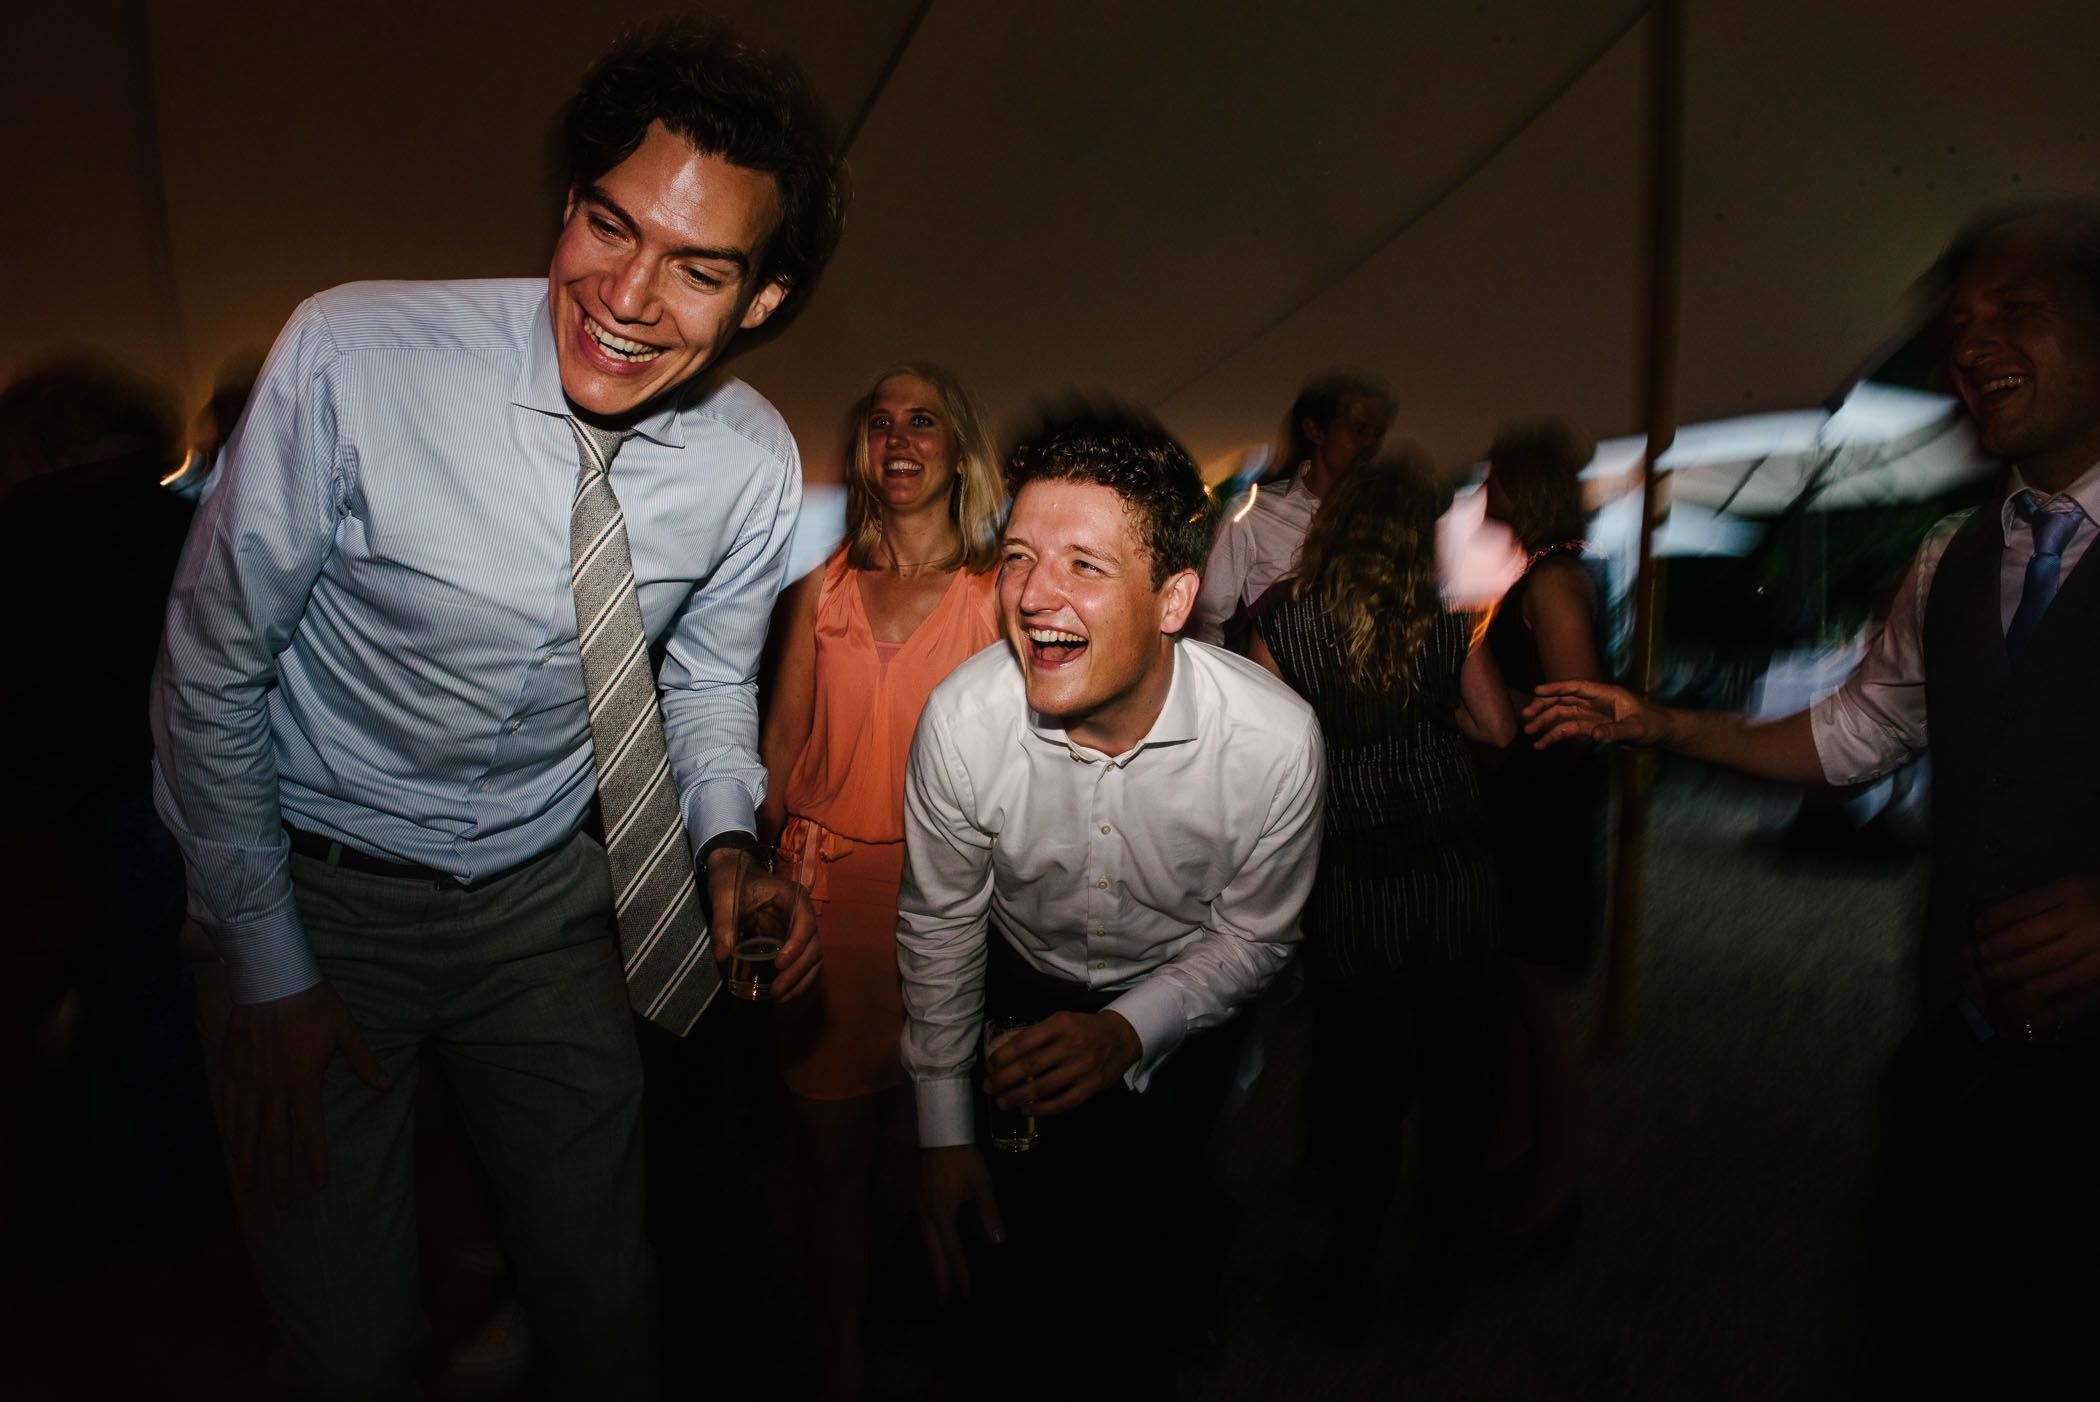 foto's bruidsfeest spontaan origineel bruidsfotograaf